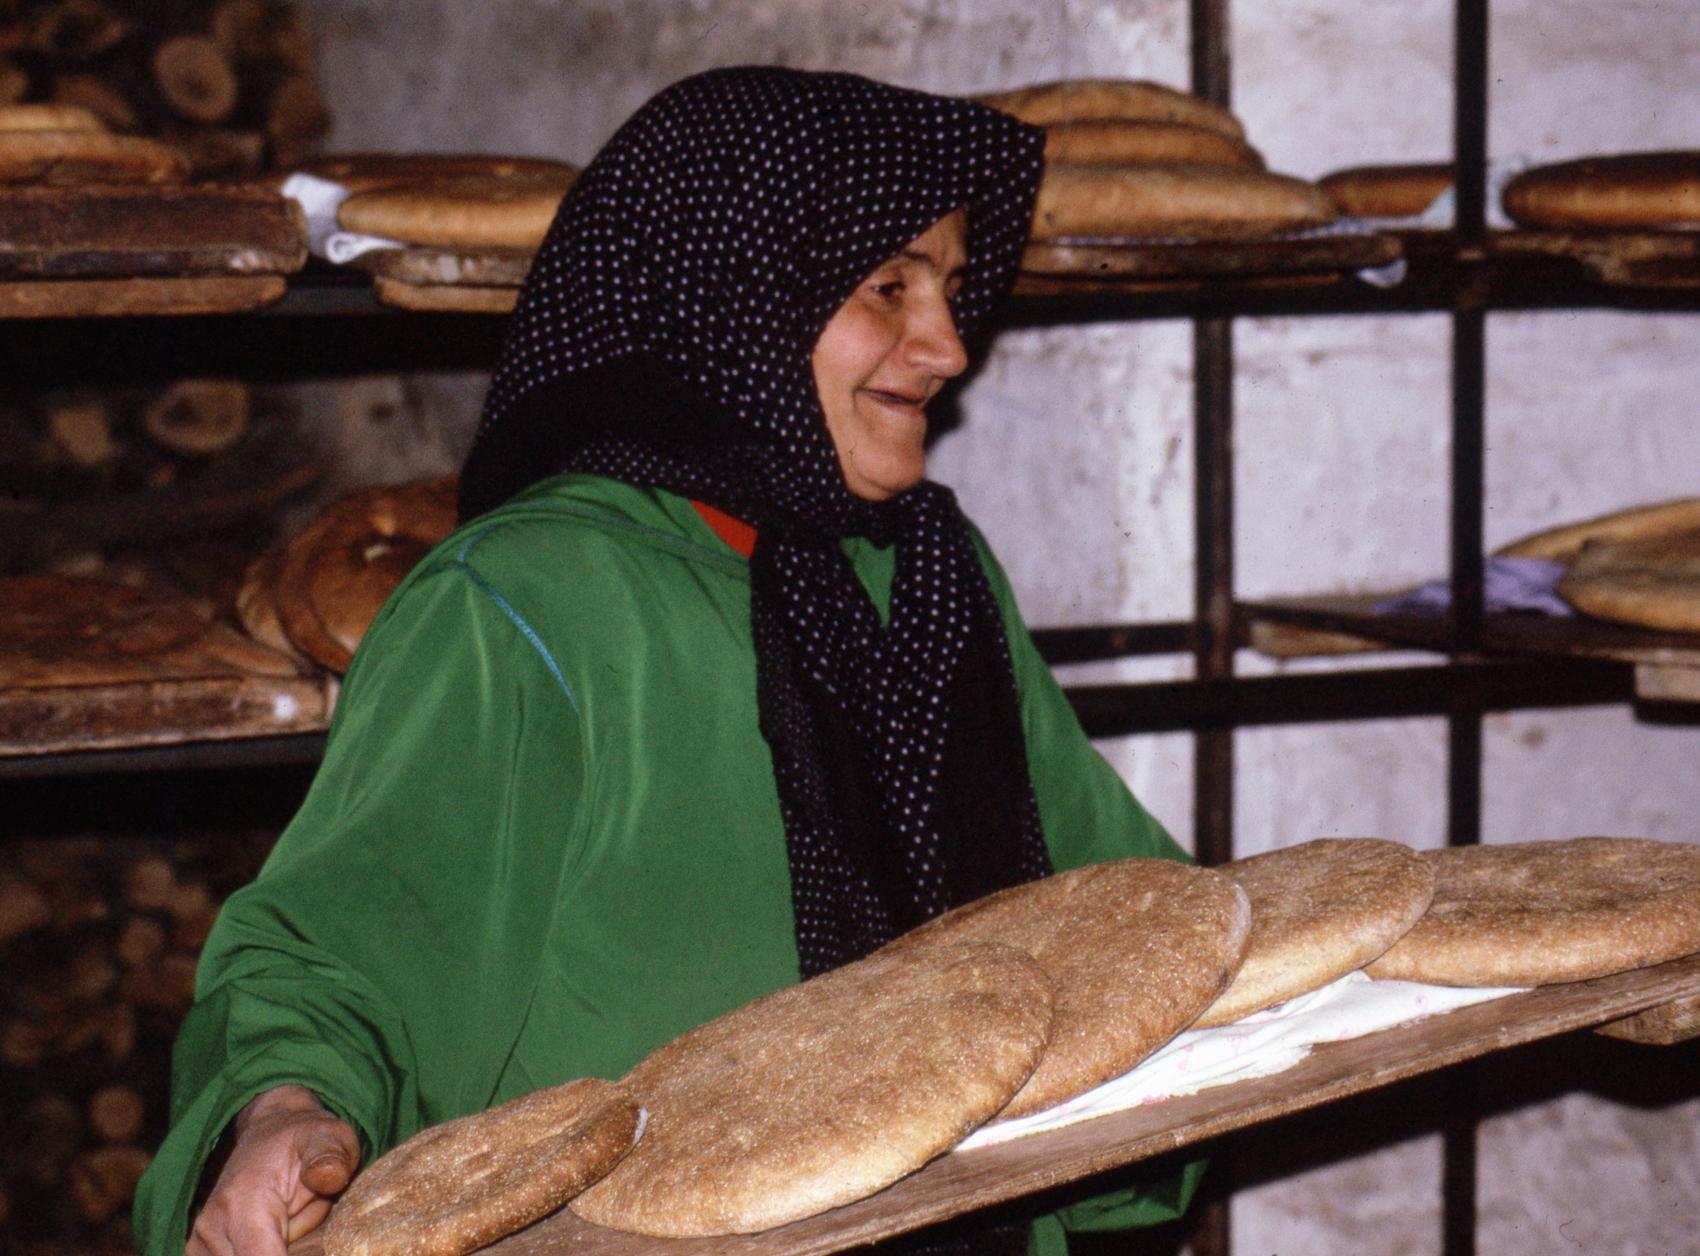 Baking bread, Morocco